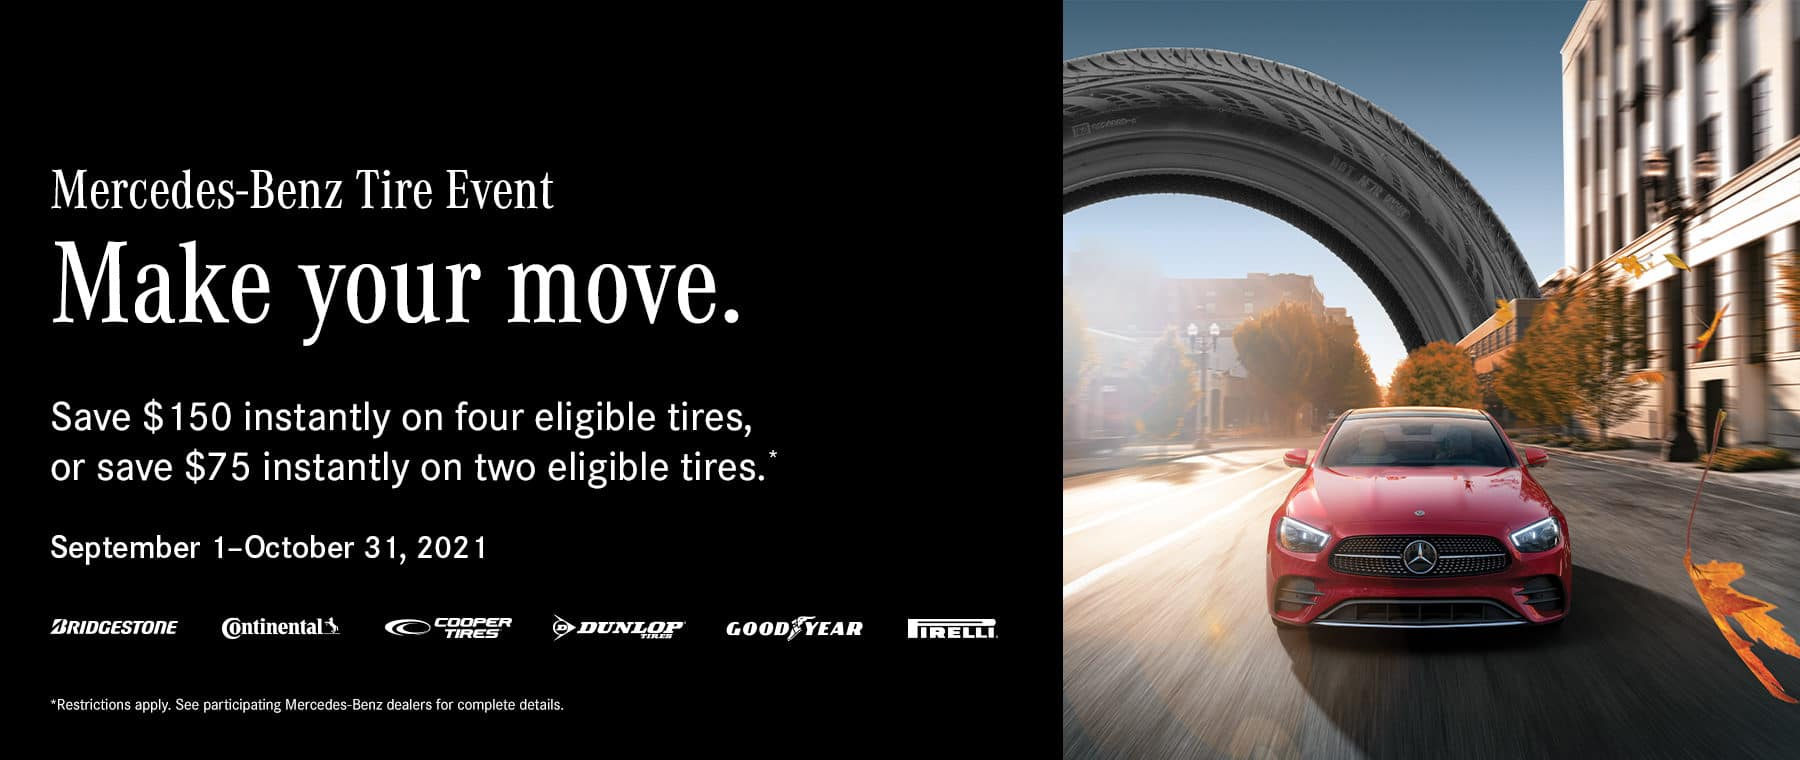 Mercedes-Benz of West Chester Mercedes tire specials